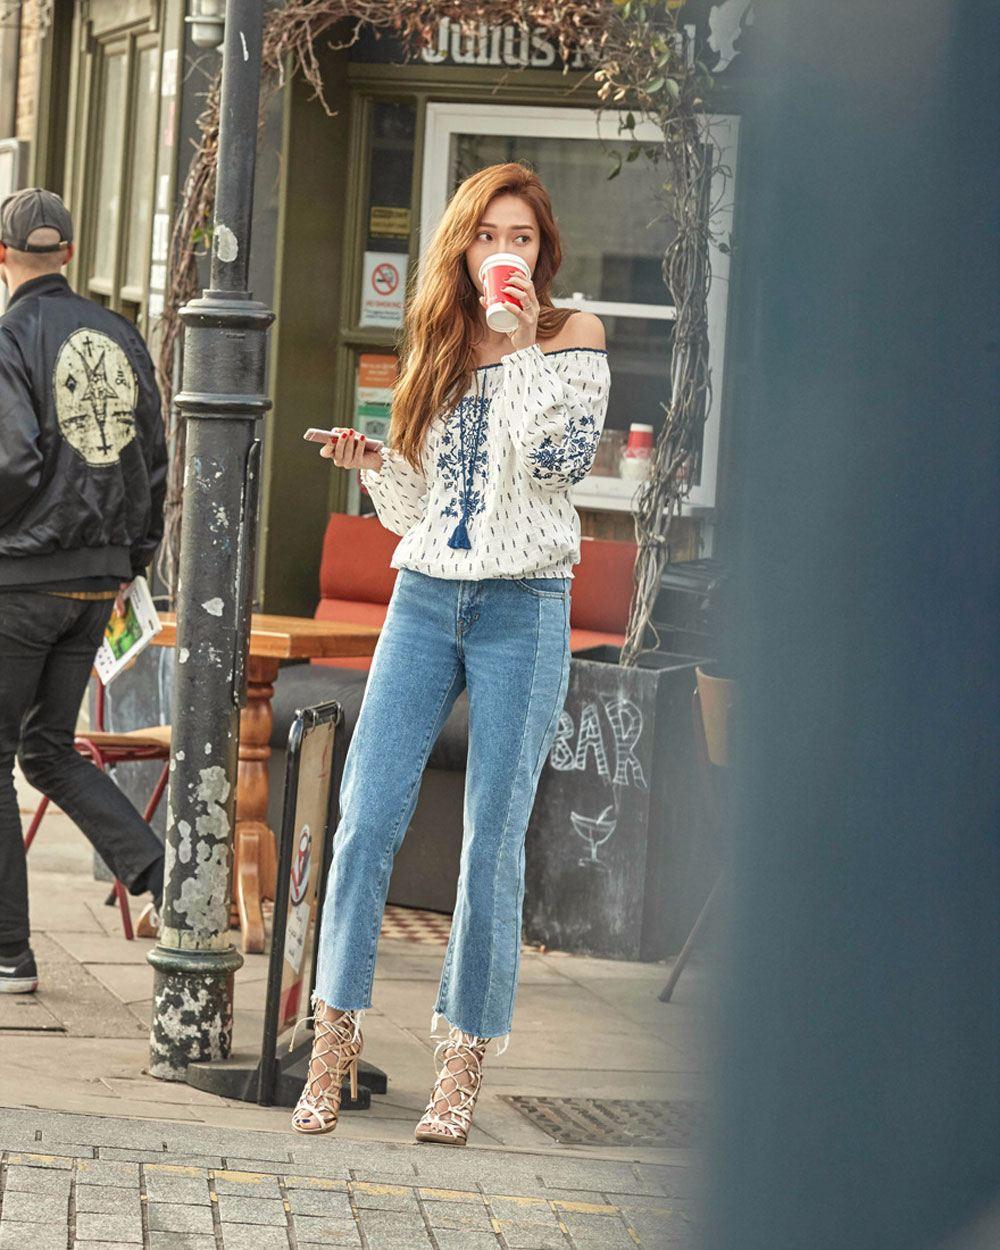 ◇ Jessica 上衣 Brand:GUESS Price:約14萬韓元(台幣約4000元)